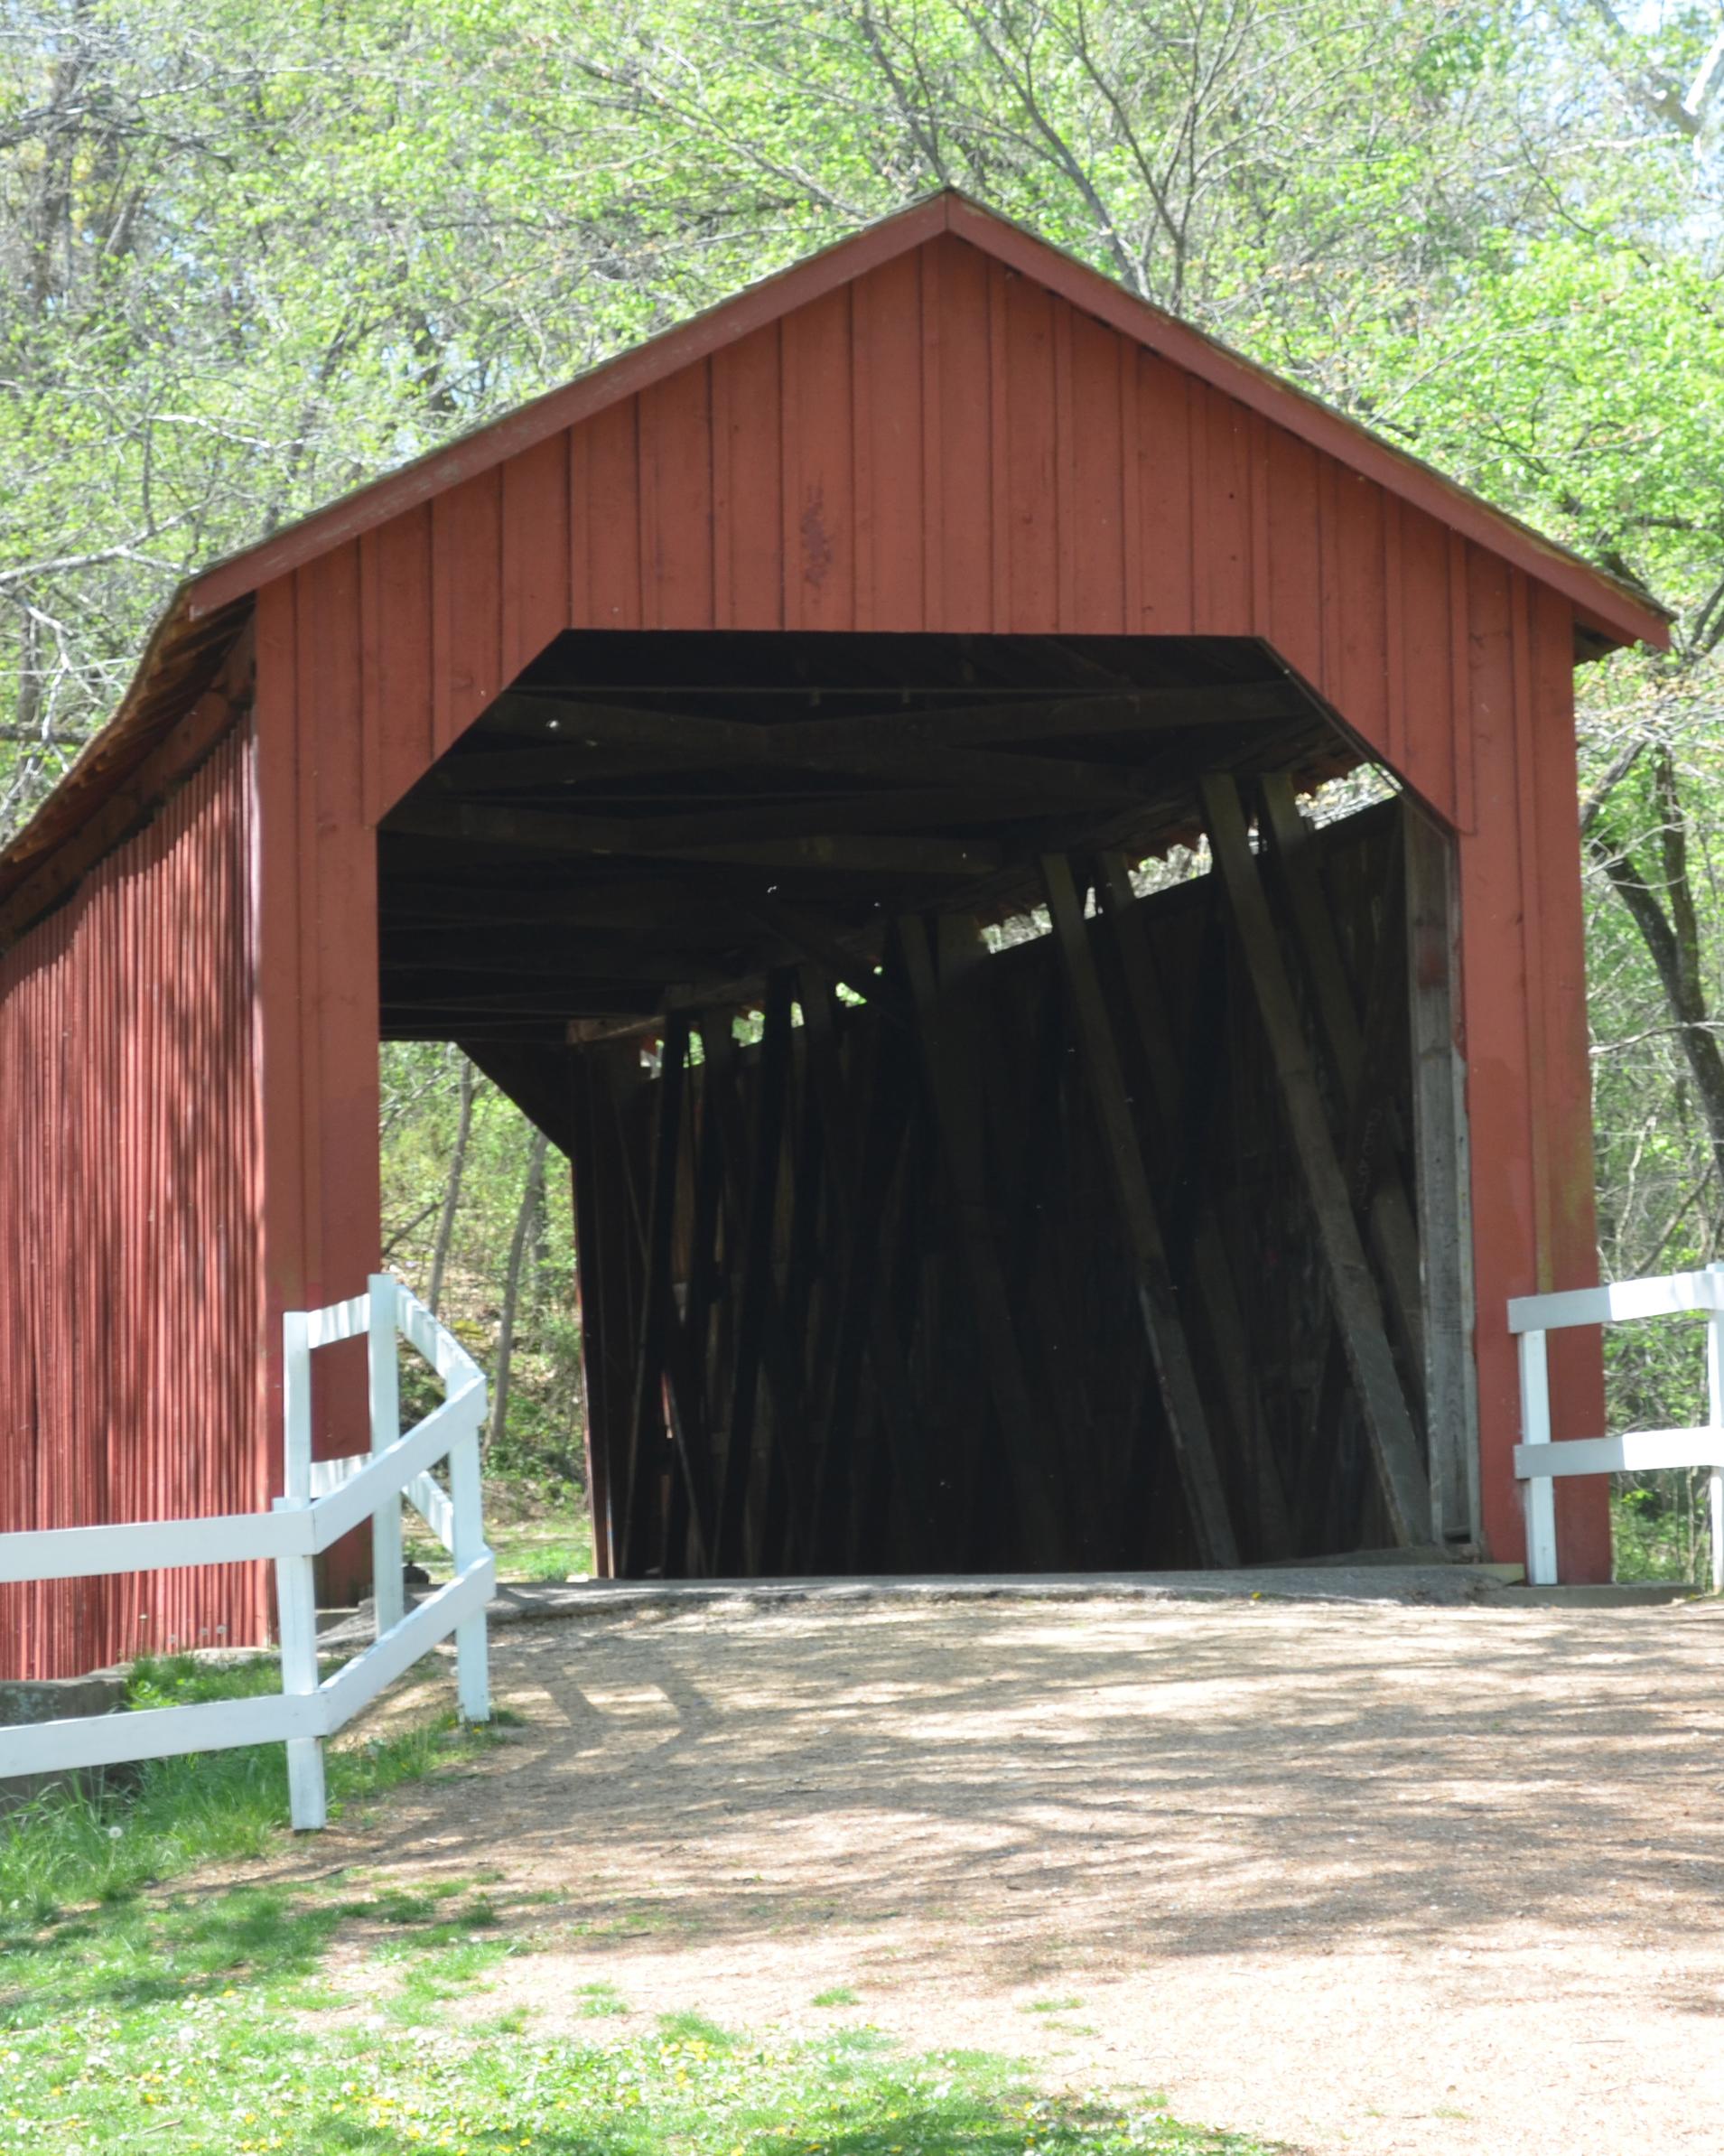 covered-bridges-sandy-creek-goldman-missouri-0714.jpg